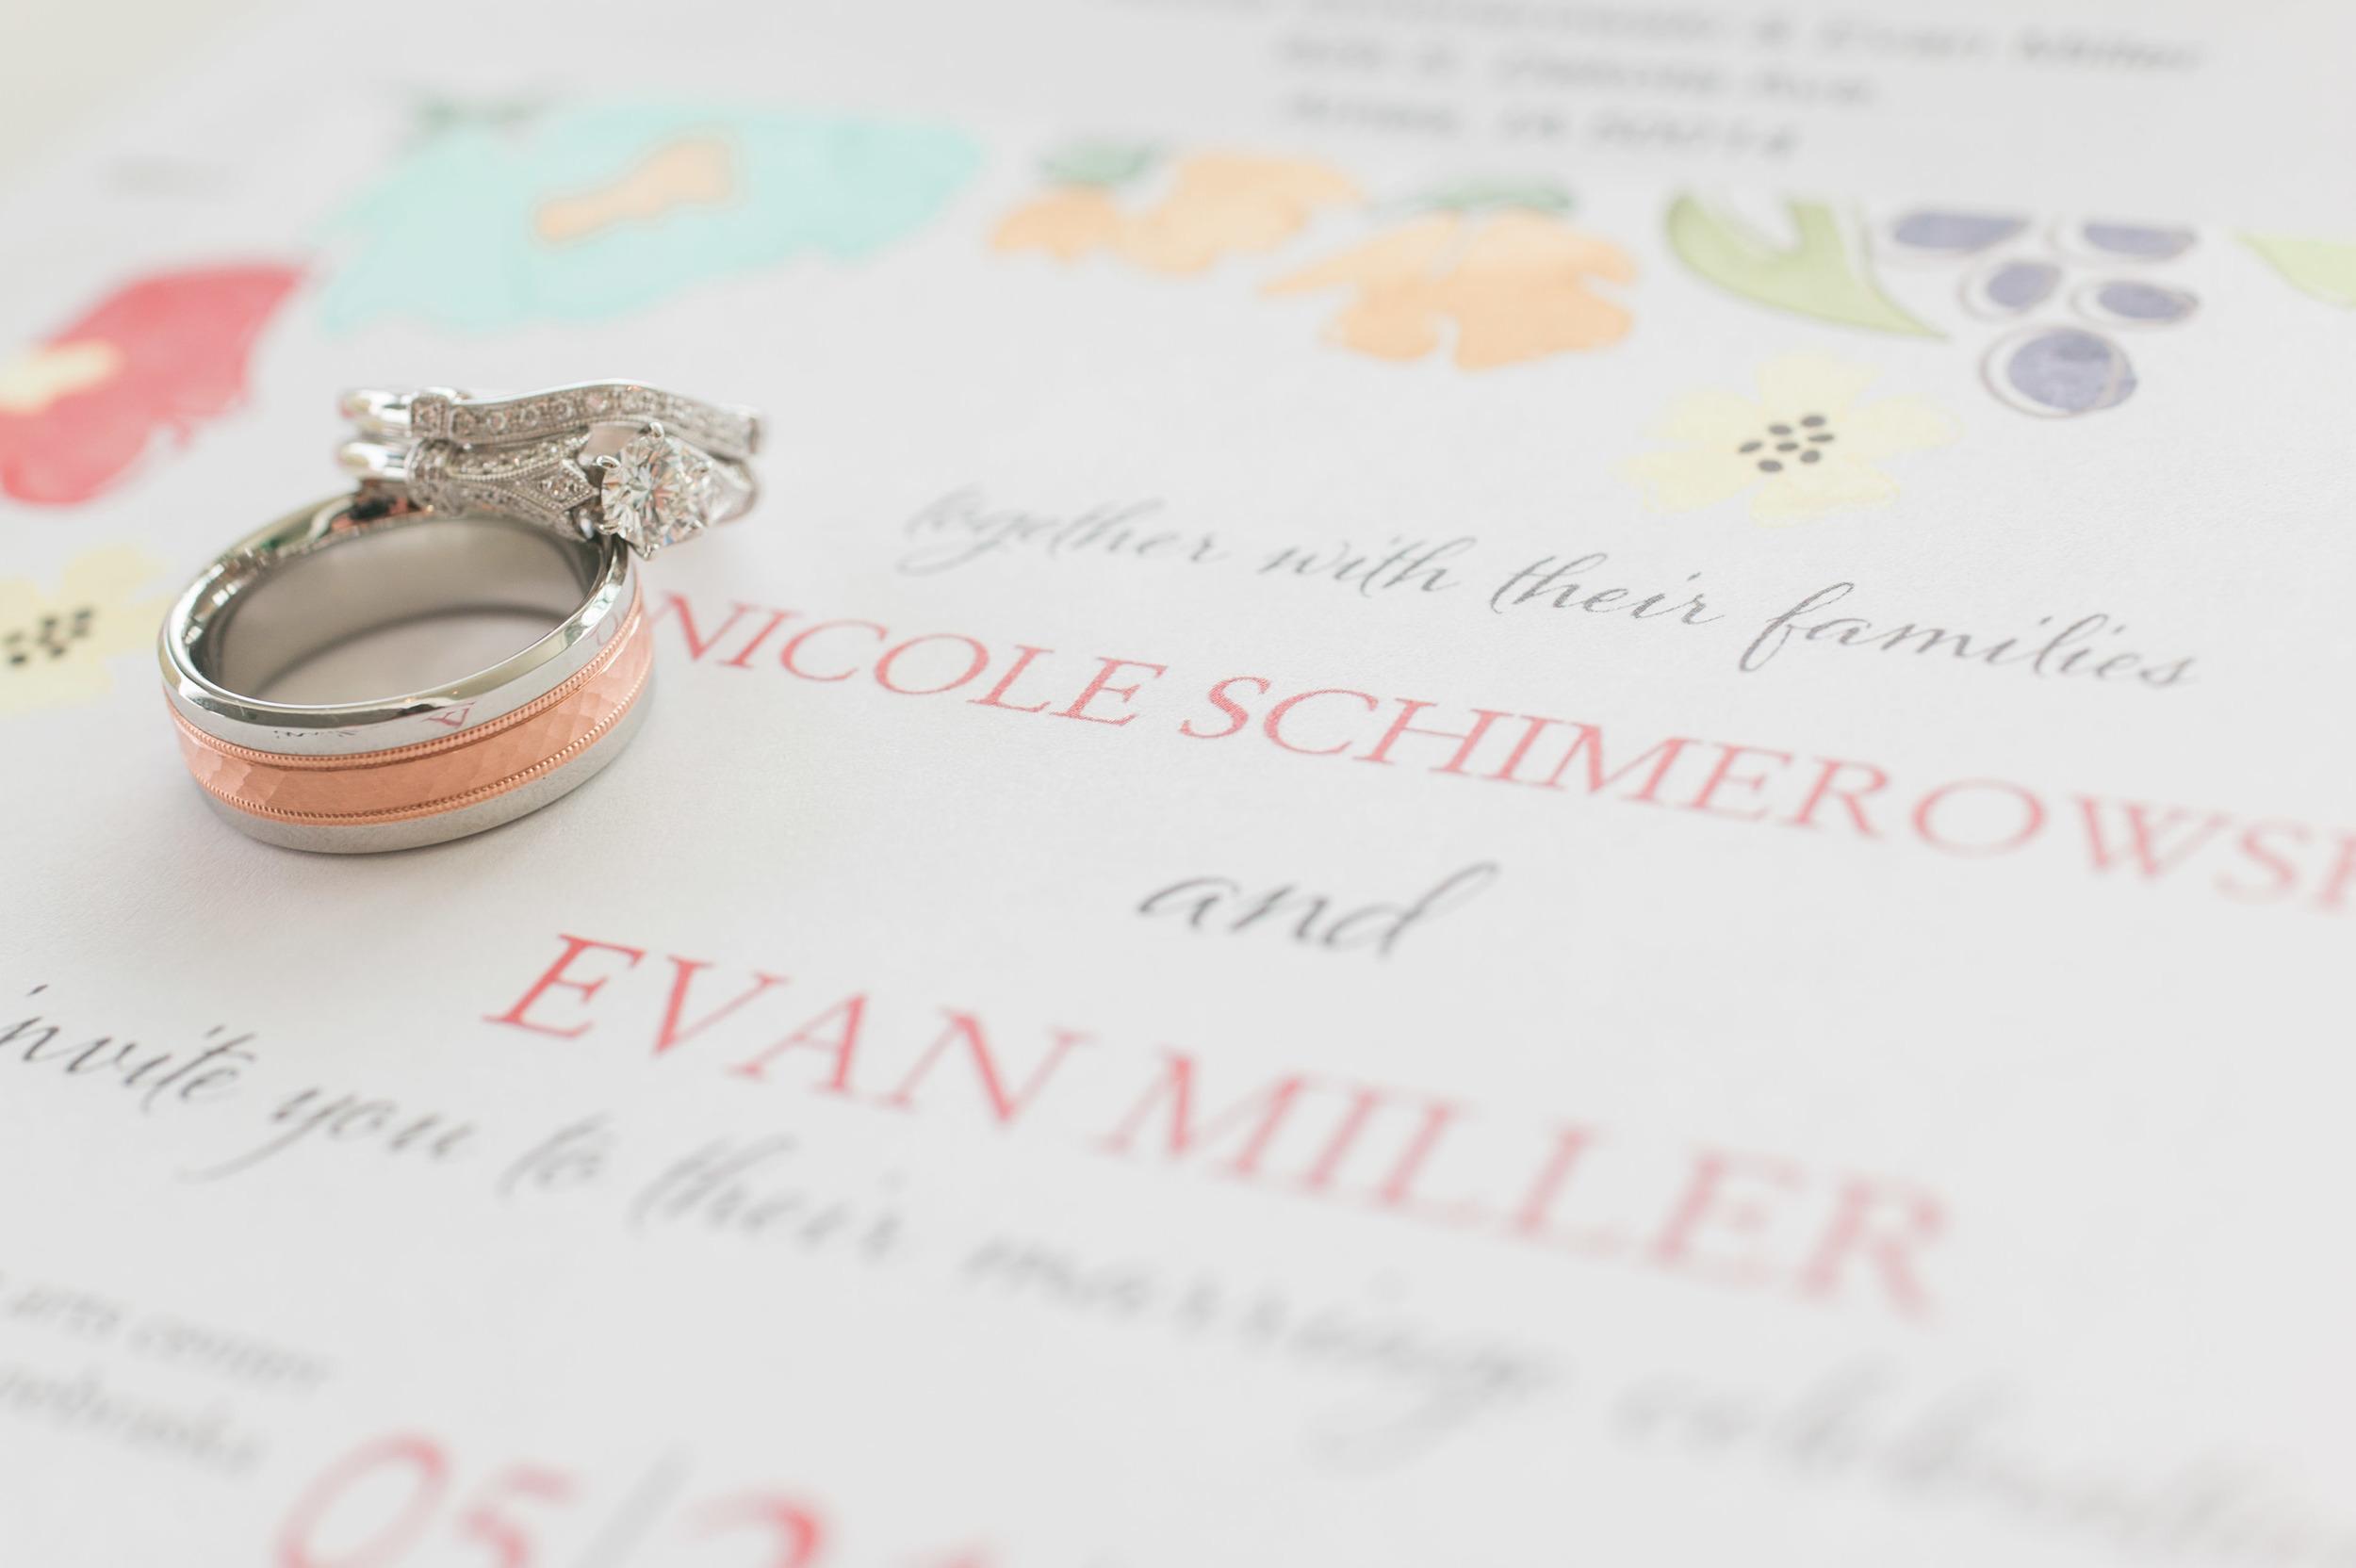 omaha-holland-arts-center-wedding-15.jpg